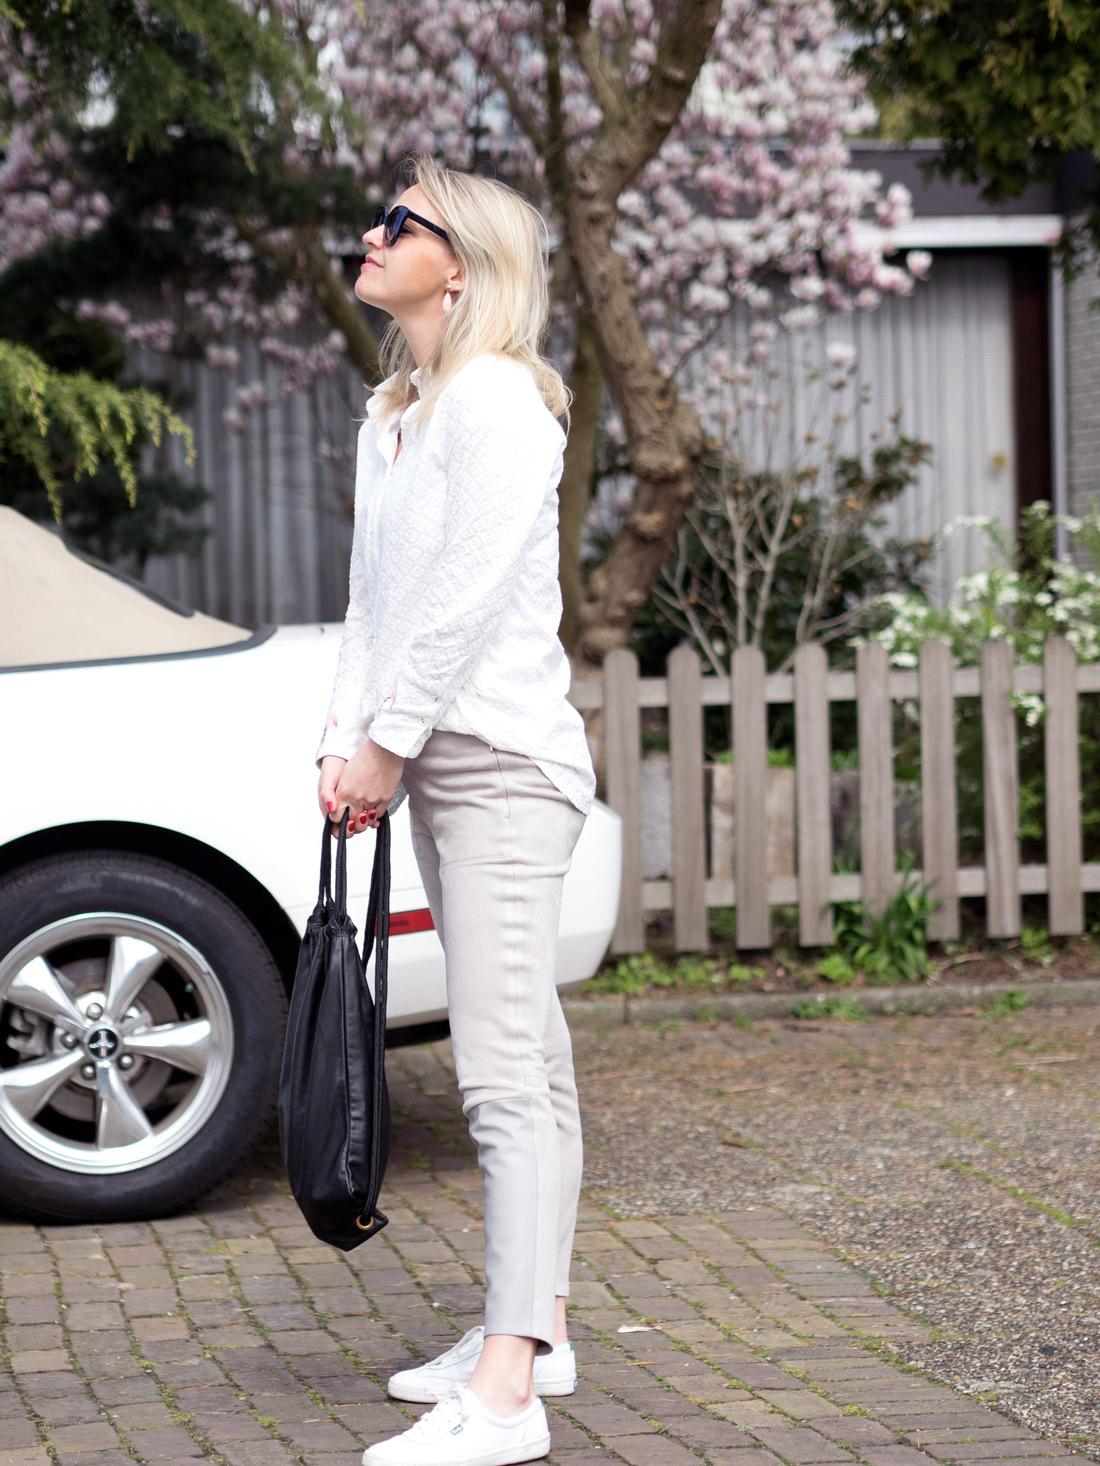 BAGATYOU_Susanne_Bavinck_Bender_Blogger_Fashion_Amsterdam_By_Marinke_Davelaar-Spring---Bracha-Design